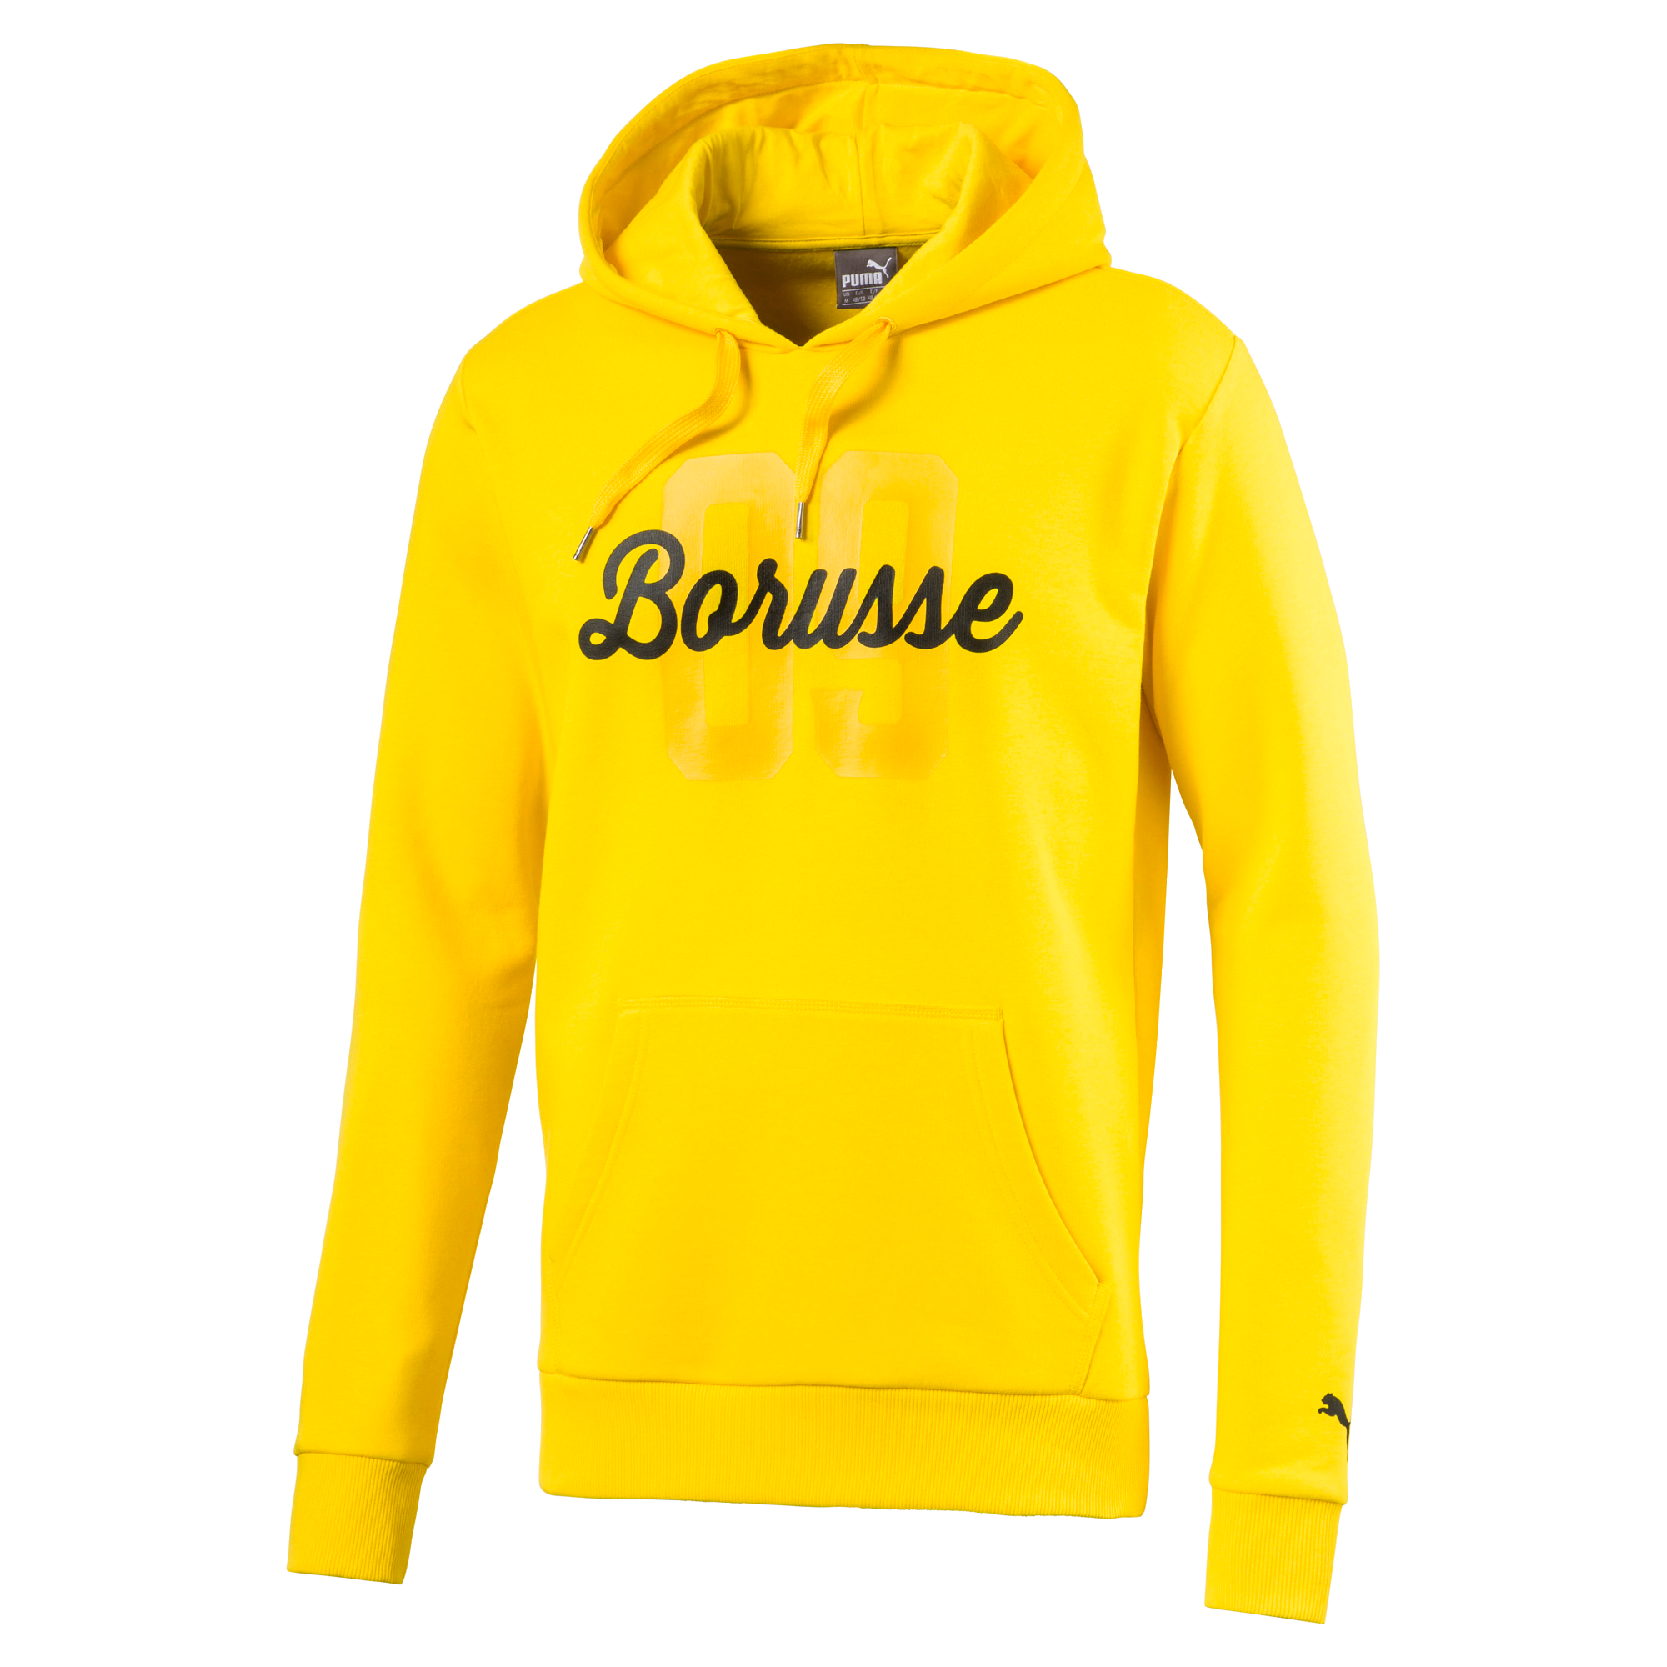 Puma BVB Borussia Dortmund BORUSSE Hoody 1718 Herren Sweatshirt 751828 01